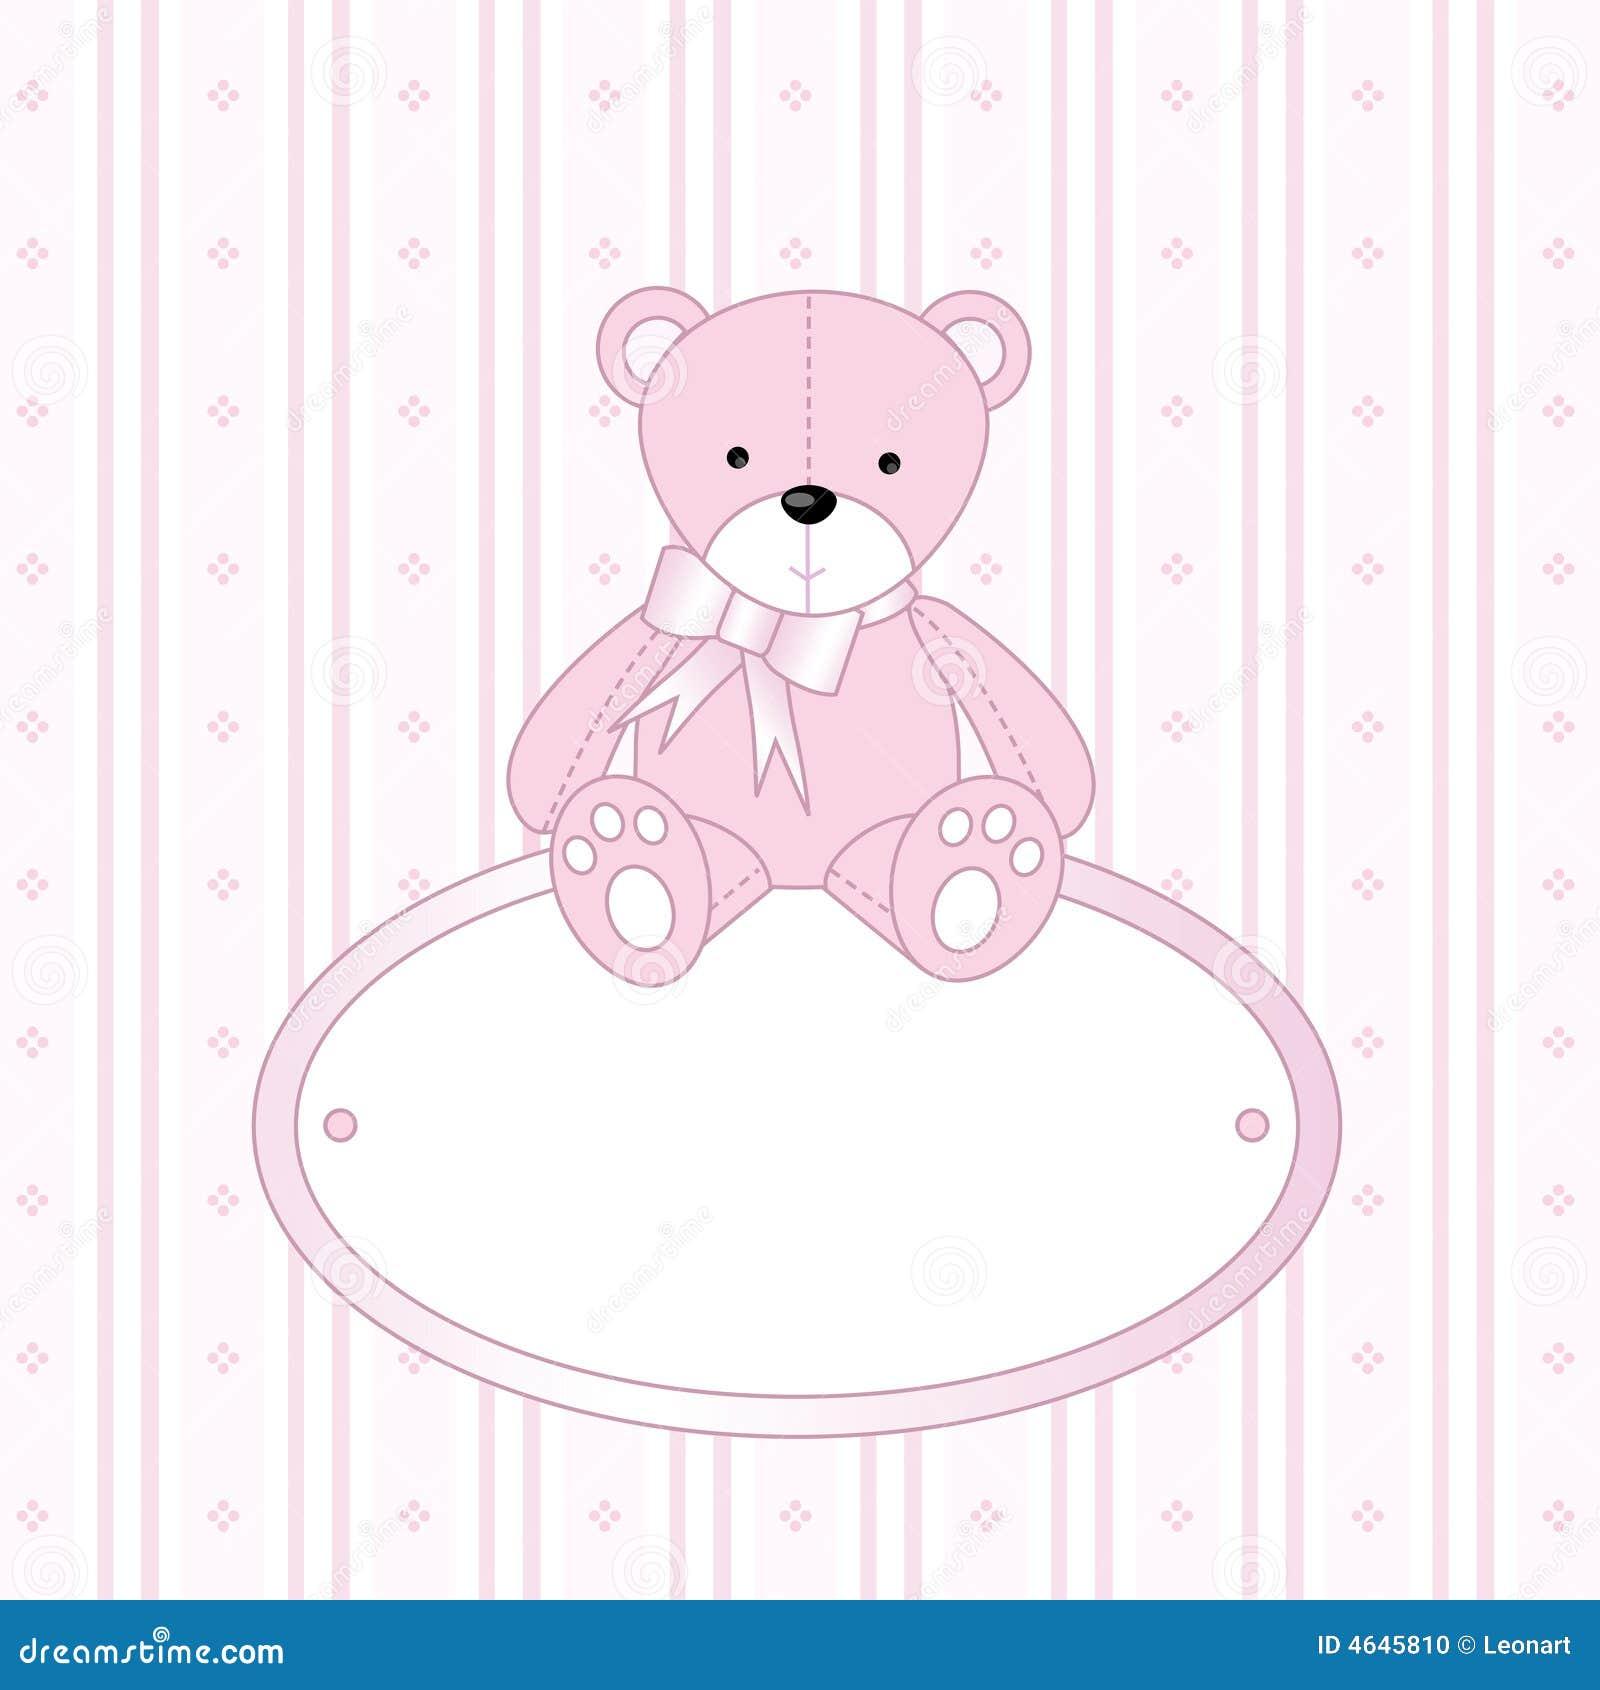 Teddy Bear For Baby Girl Stock Photo - Image: 4645810